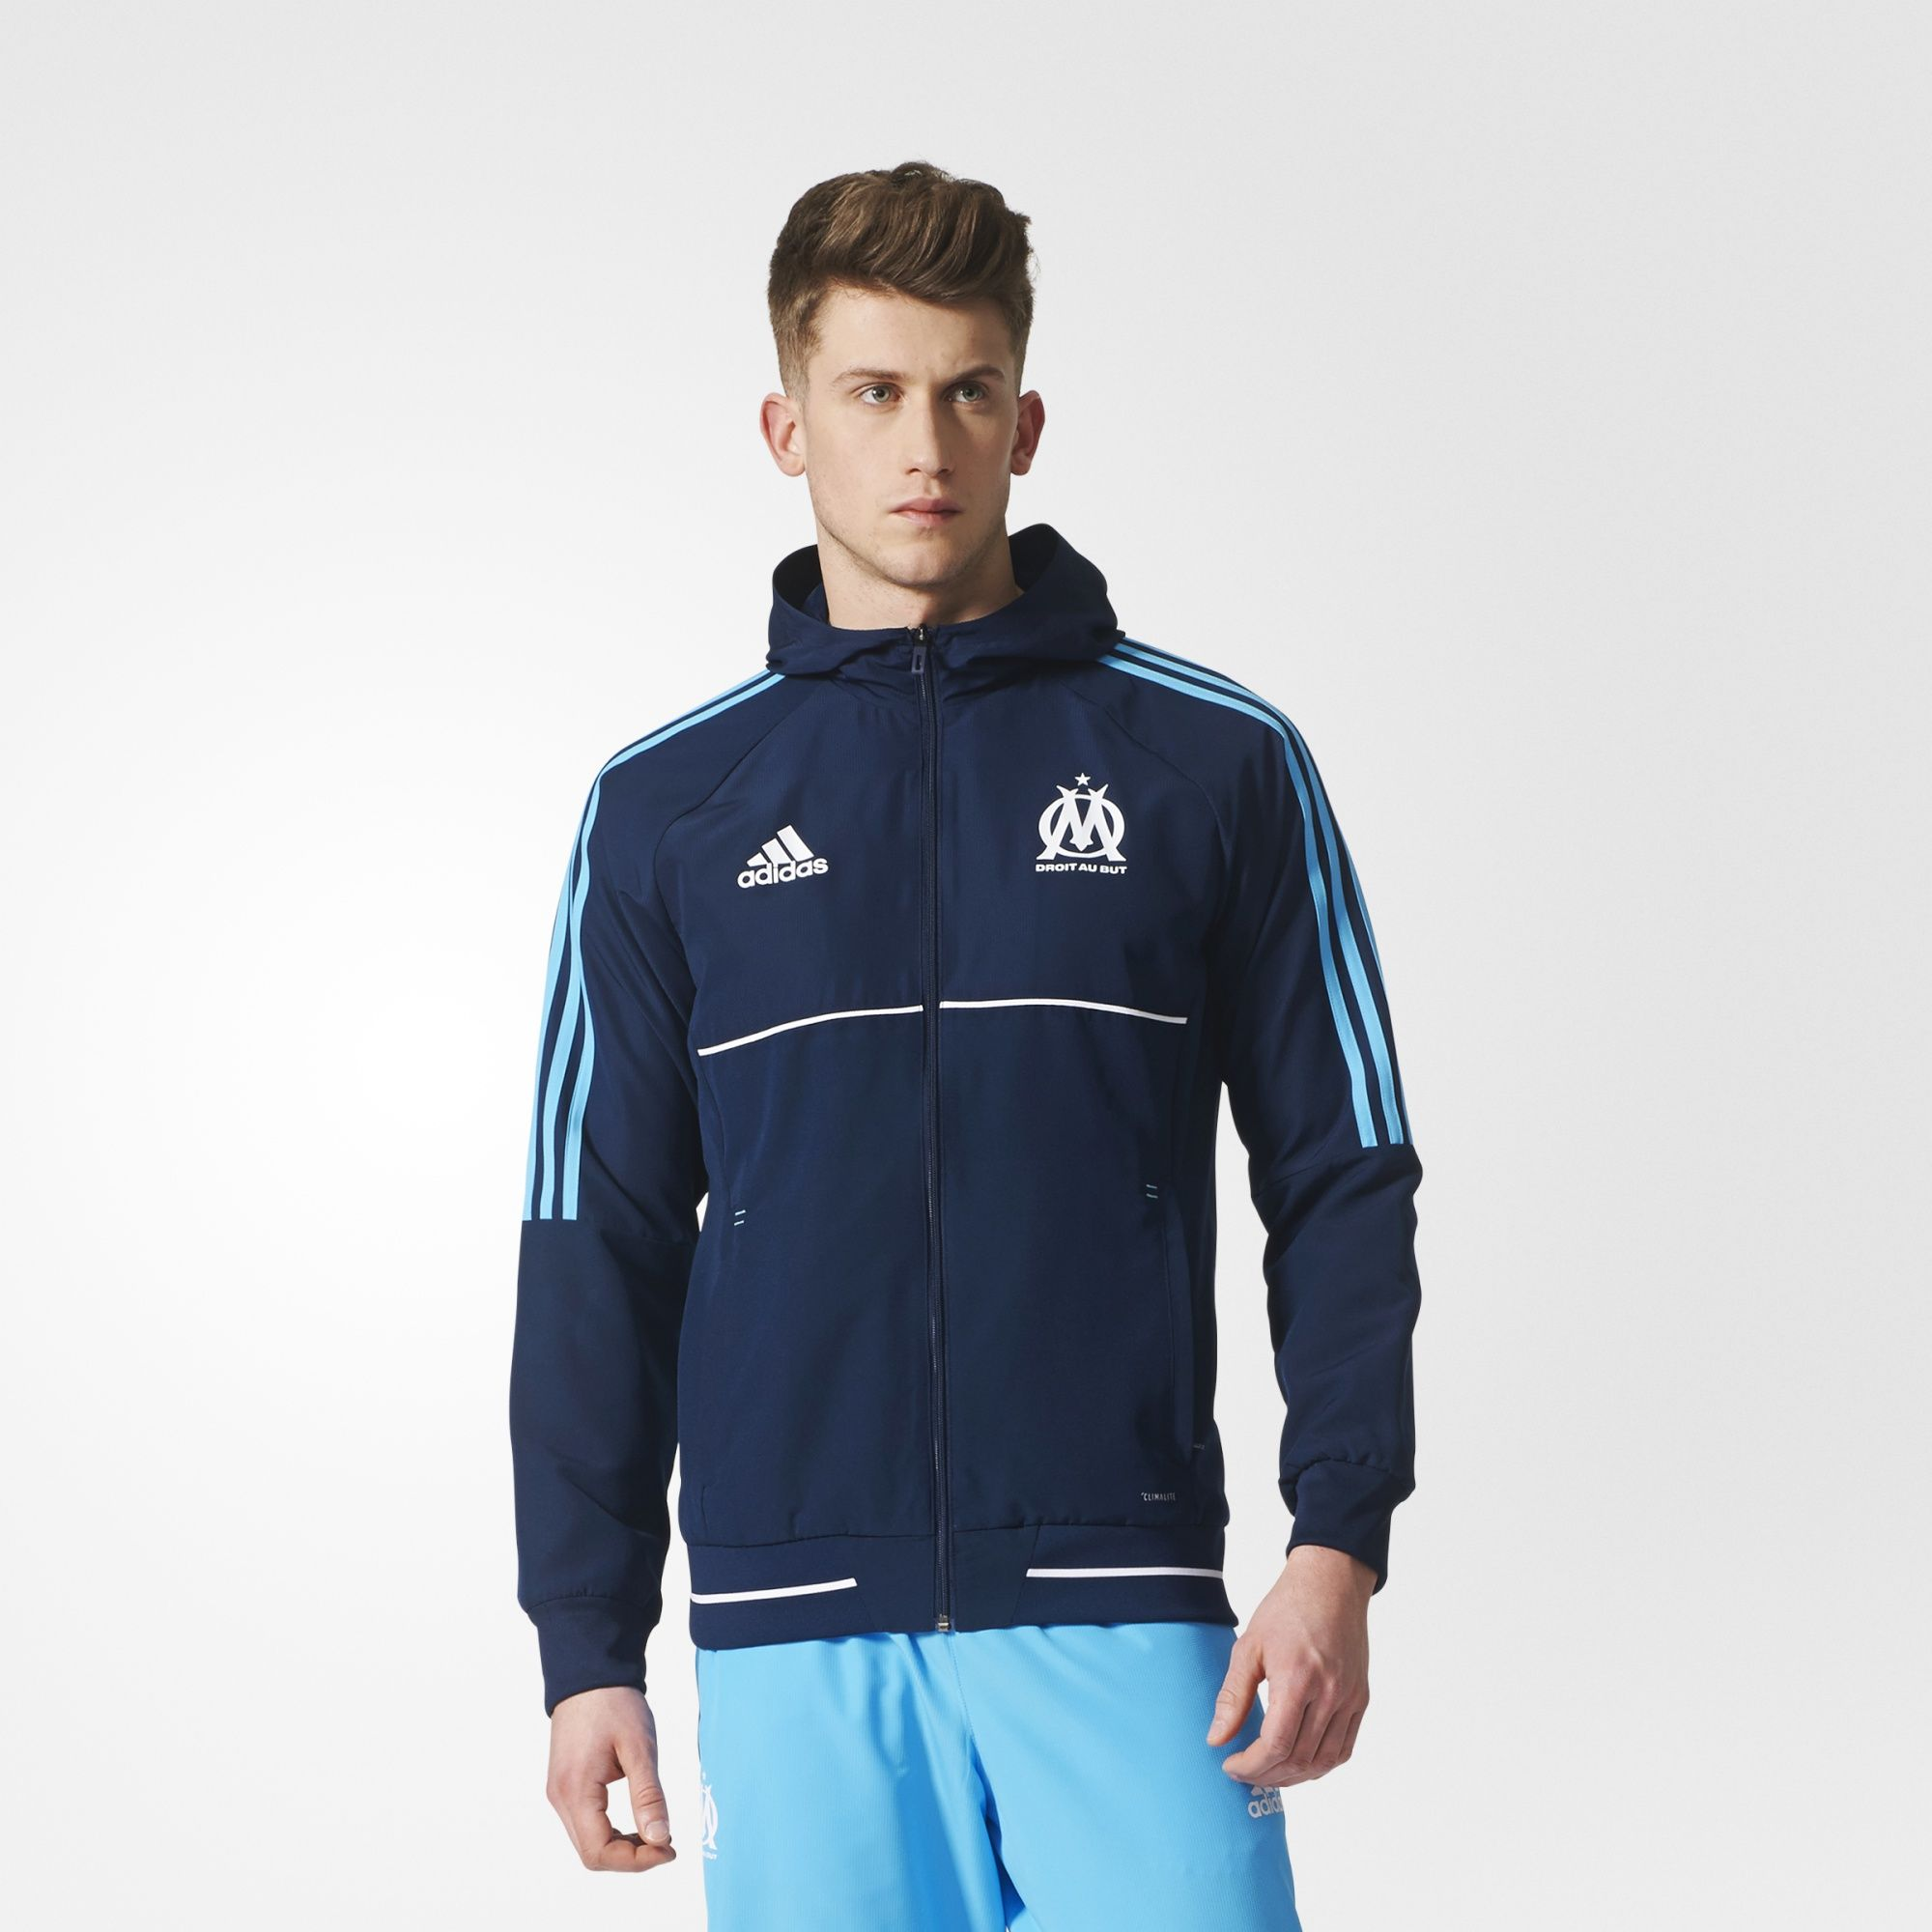 adidas olympique marseille 17 18 presentation jacket. Black Bedroom Furniture Sets. Home Design Ideas